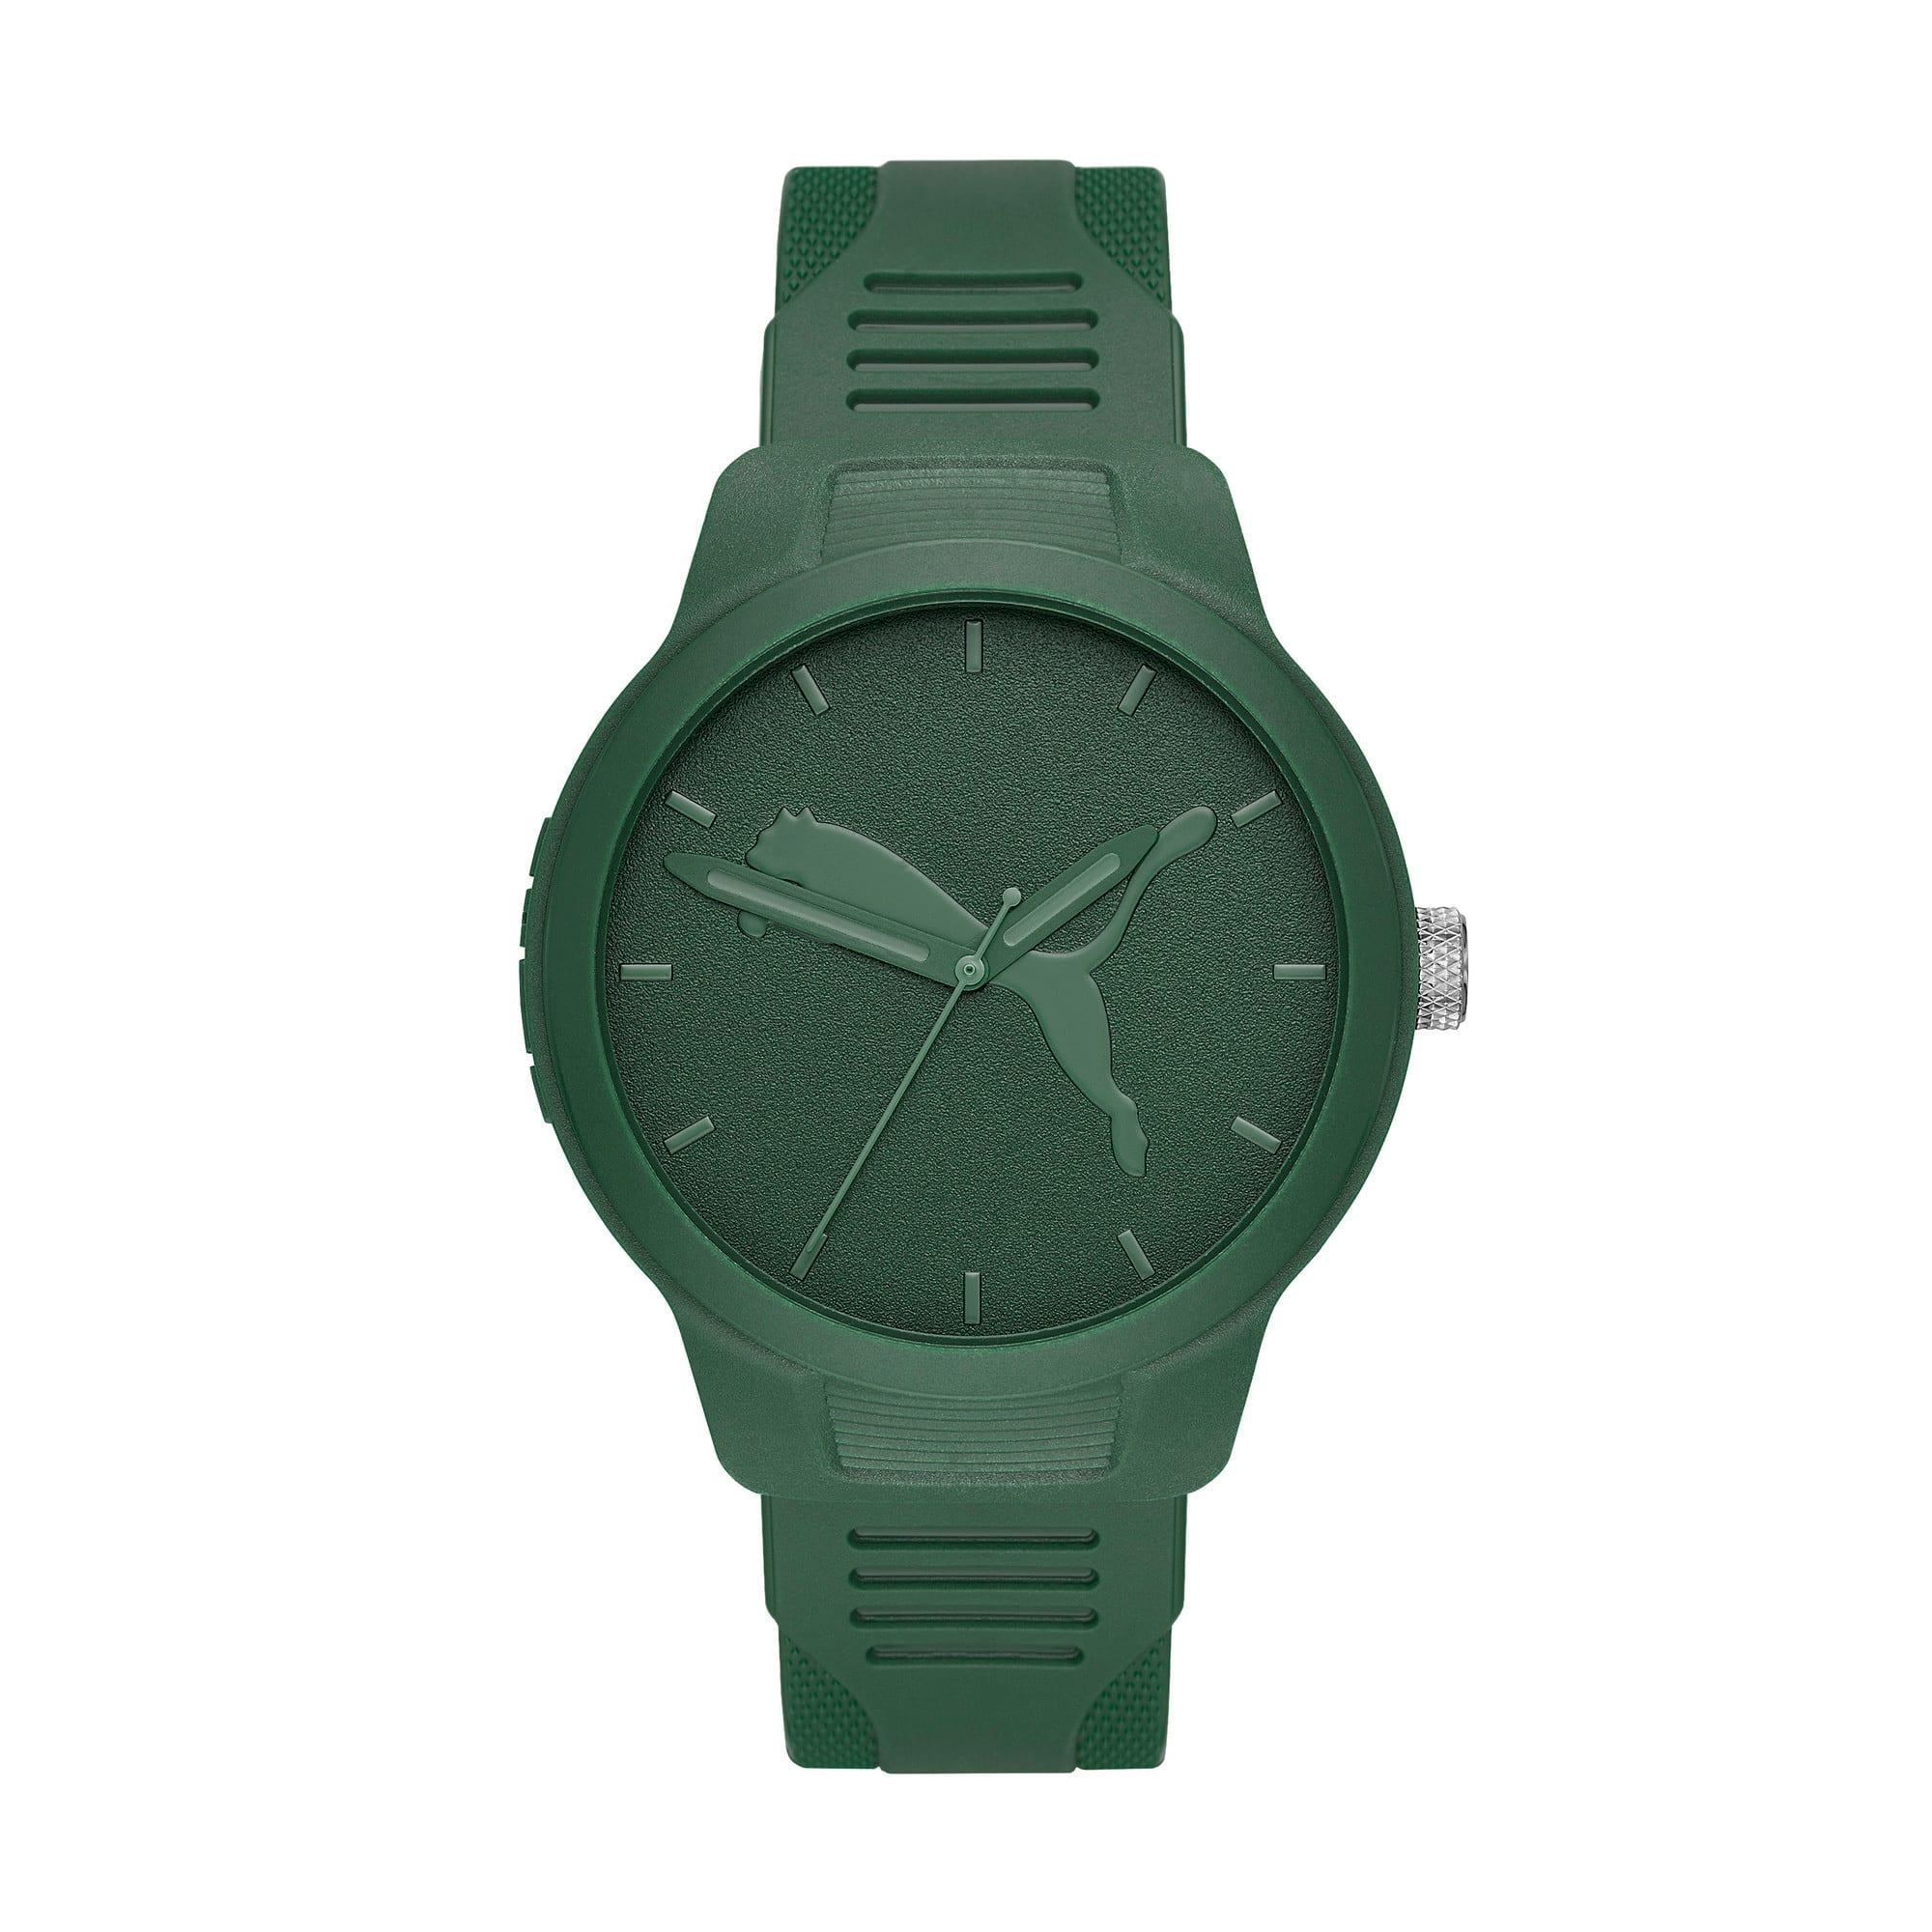 Thumbnail 1 of Reset v2 Watch, Green/Green, medium